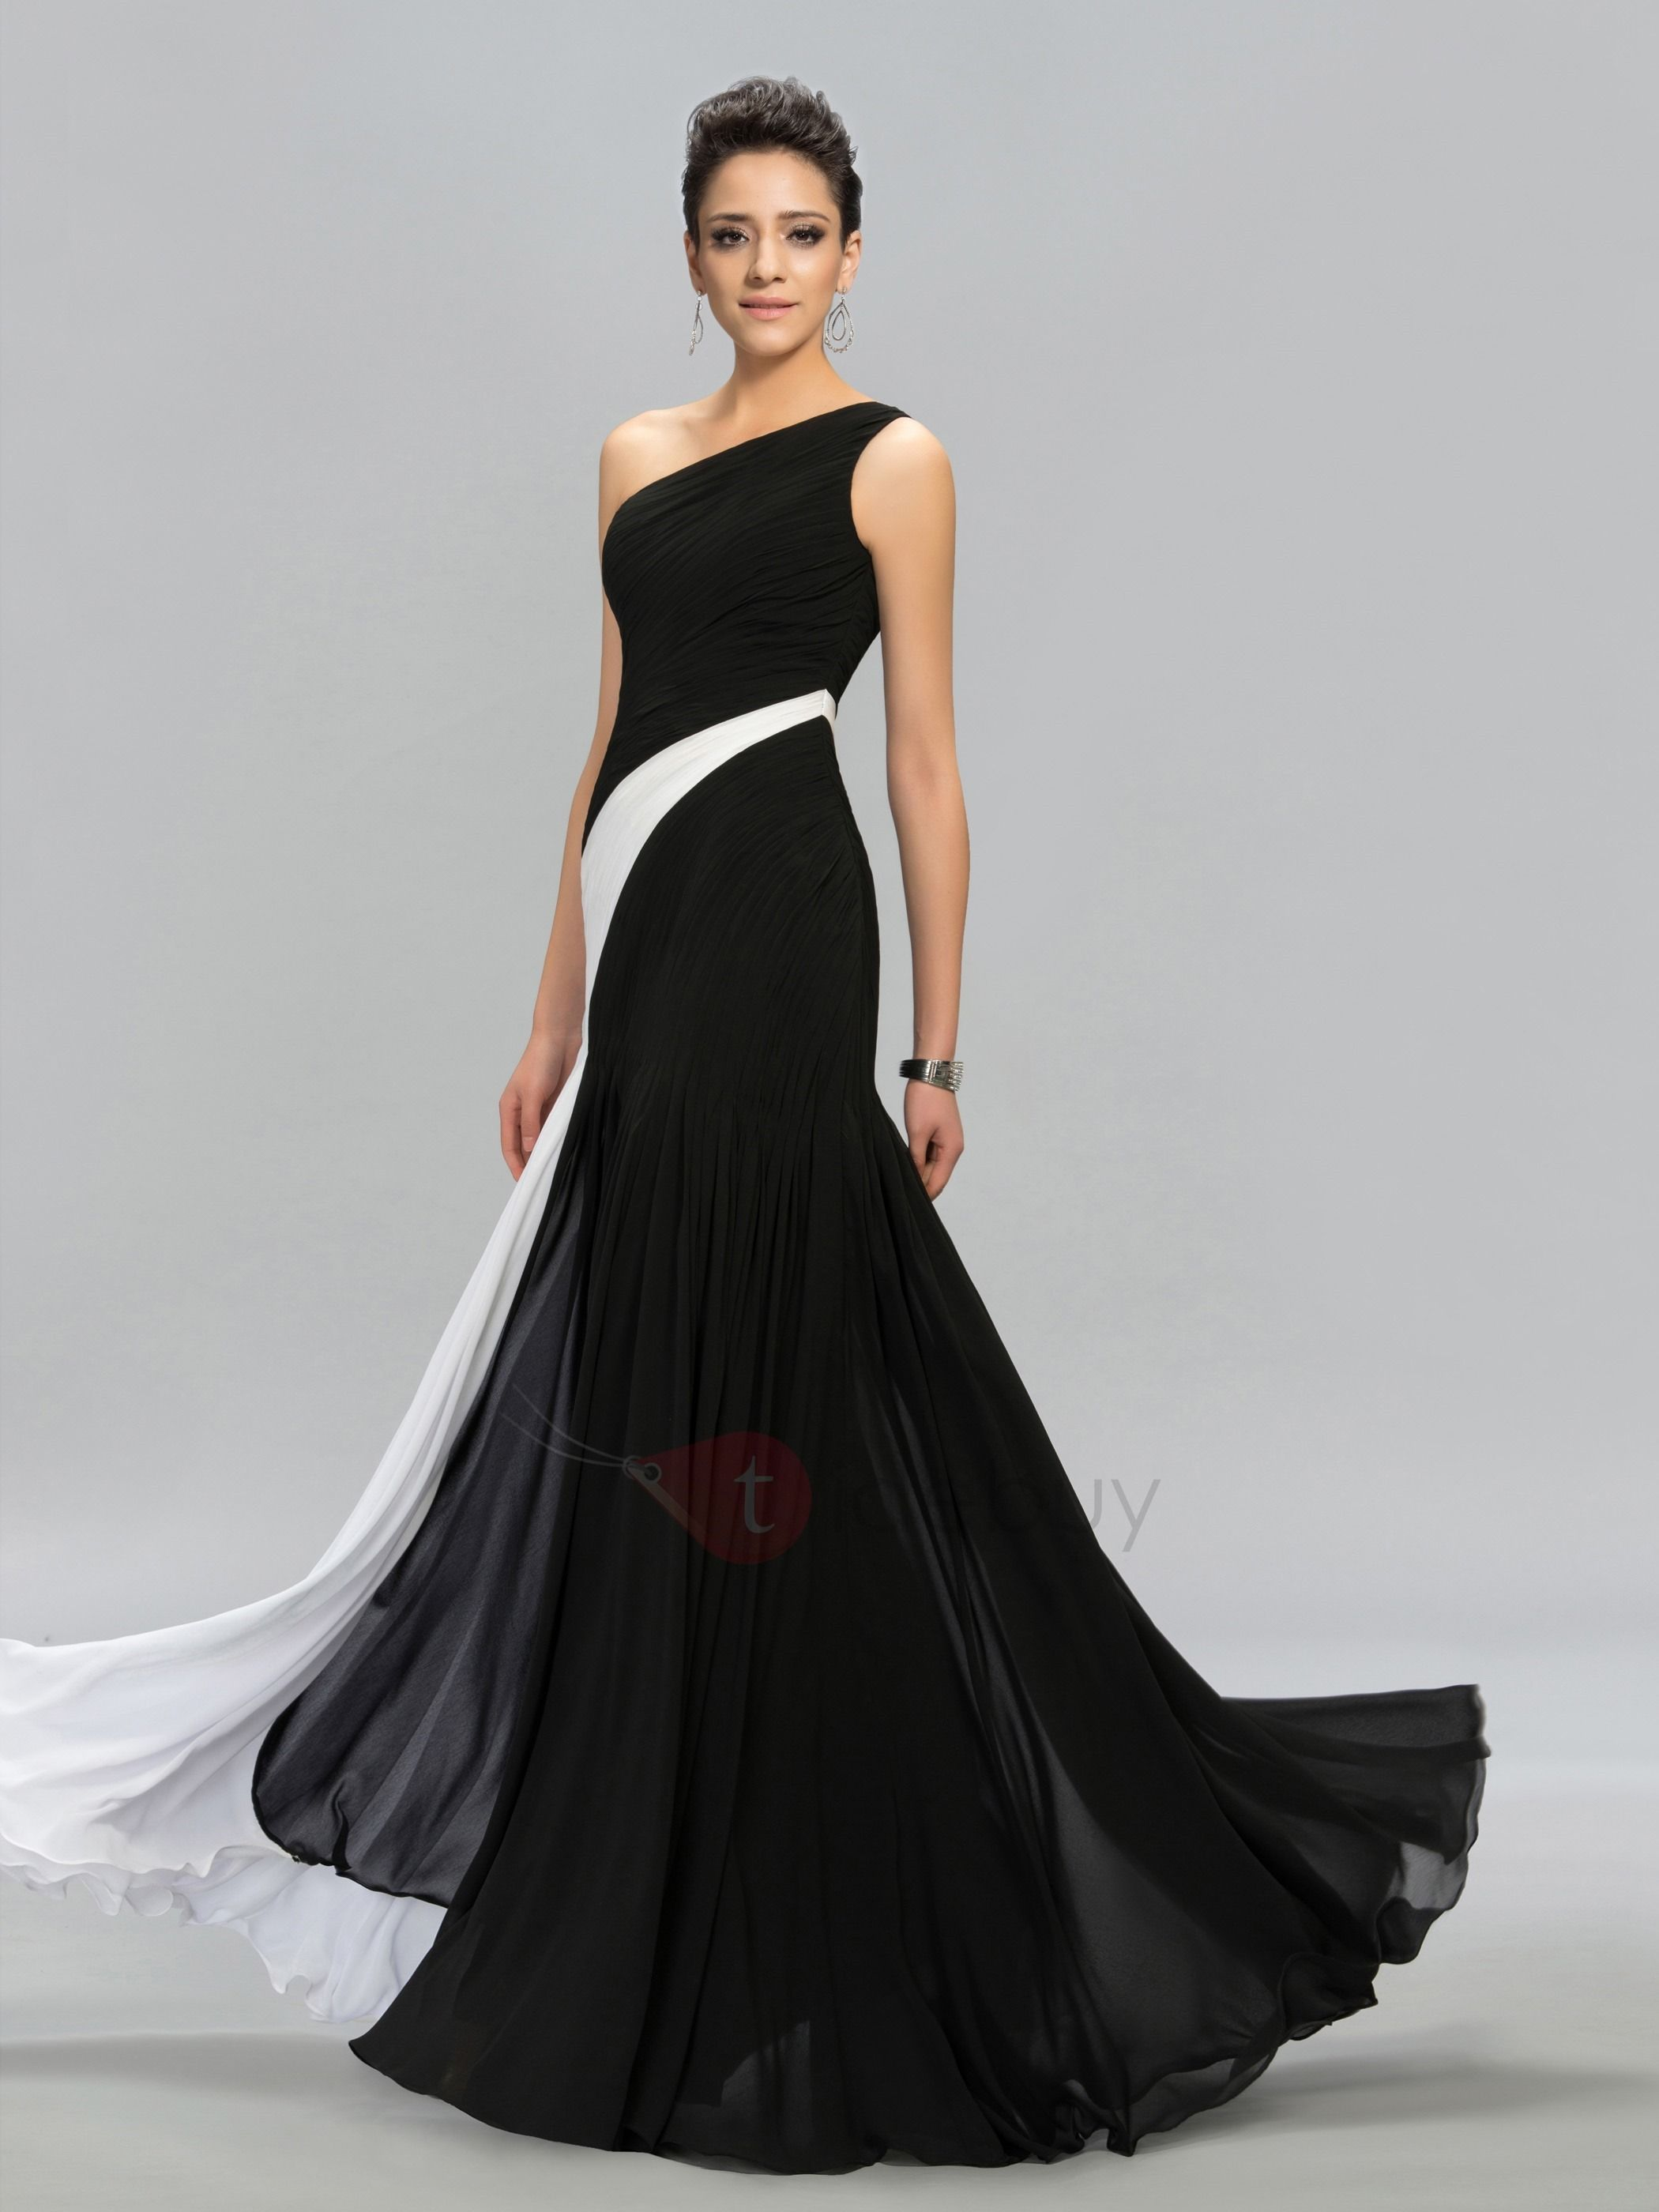 Contrast color oneshoulder evening dress diamond dress